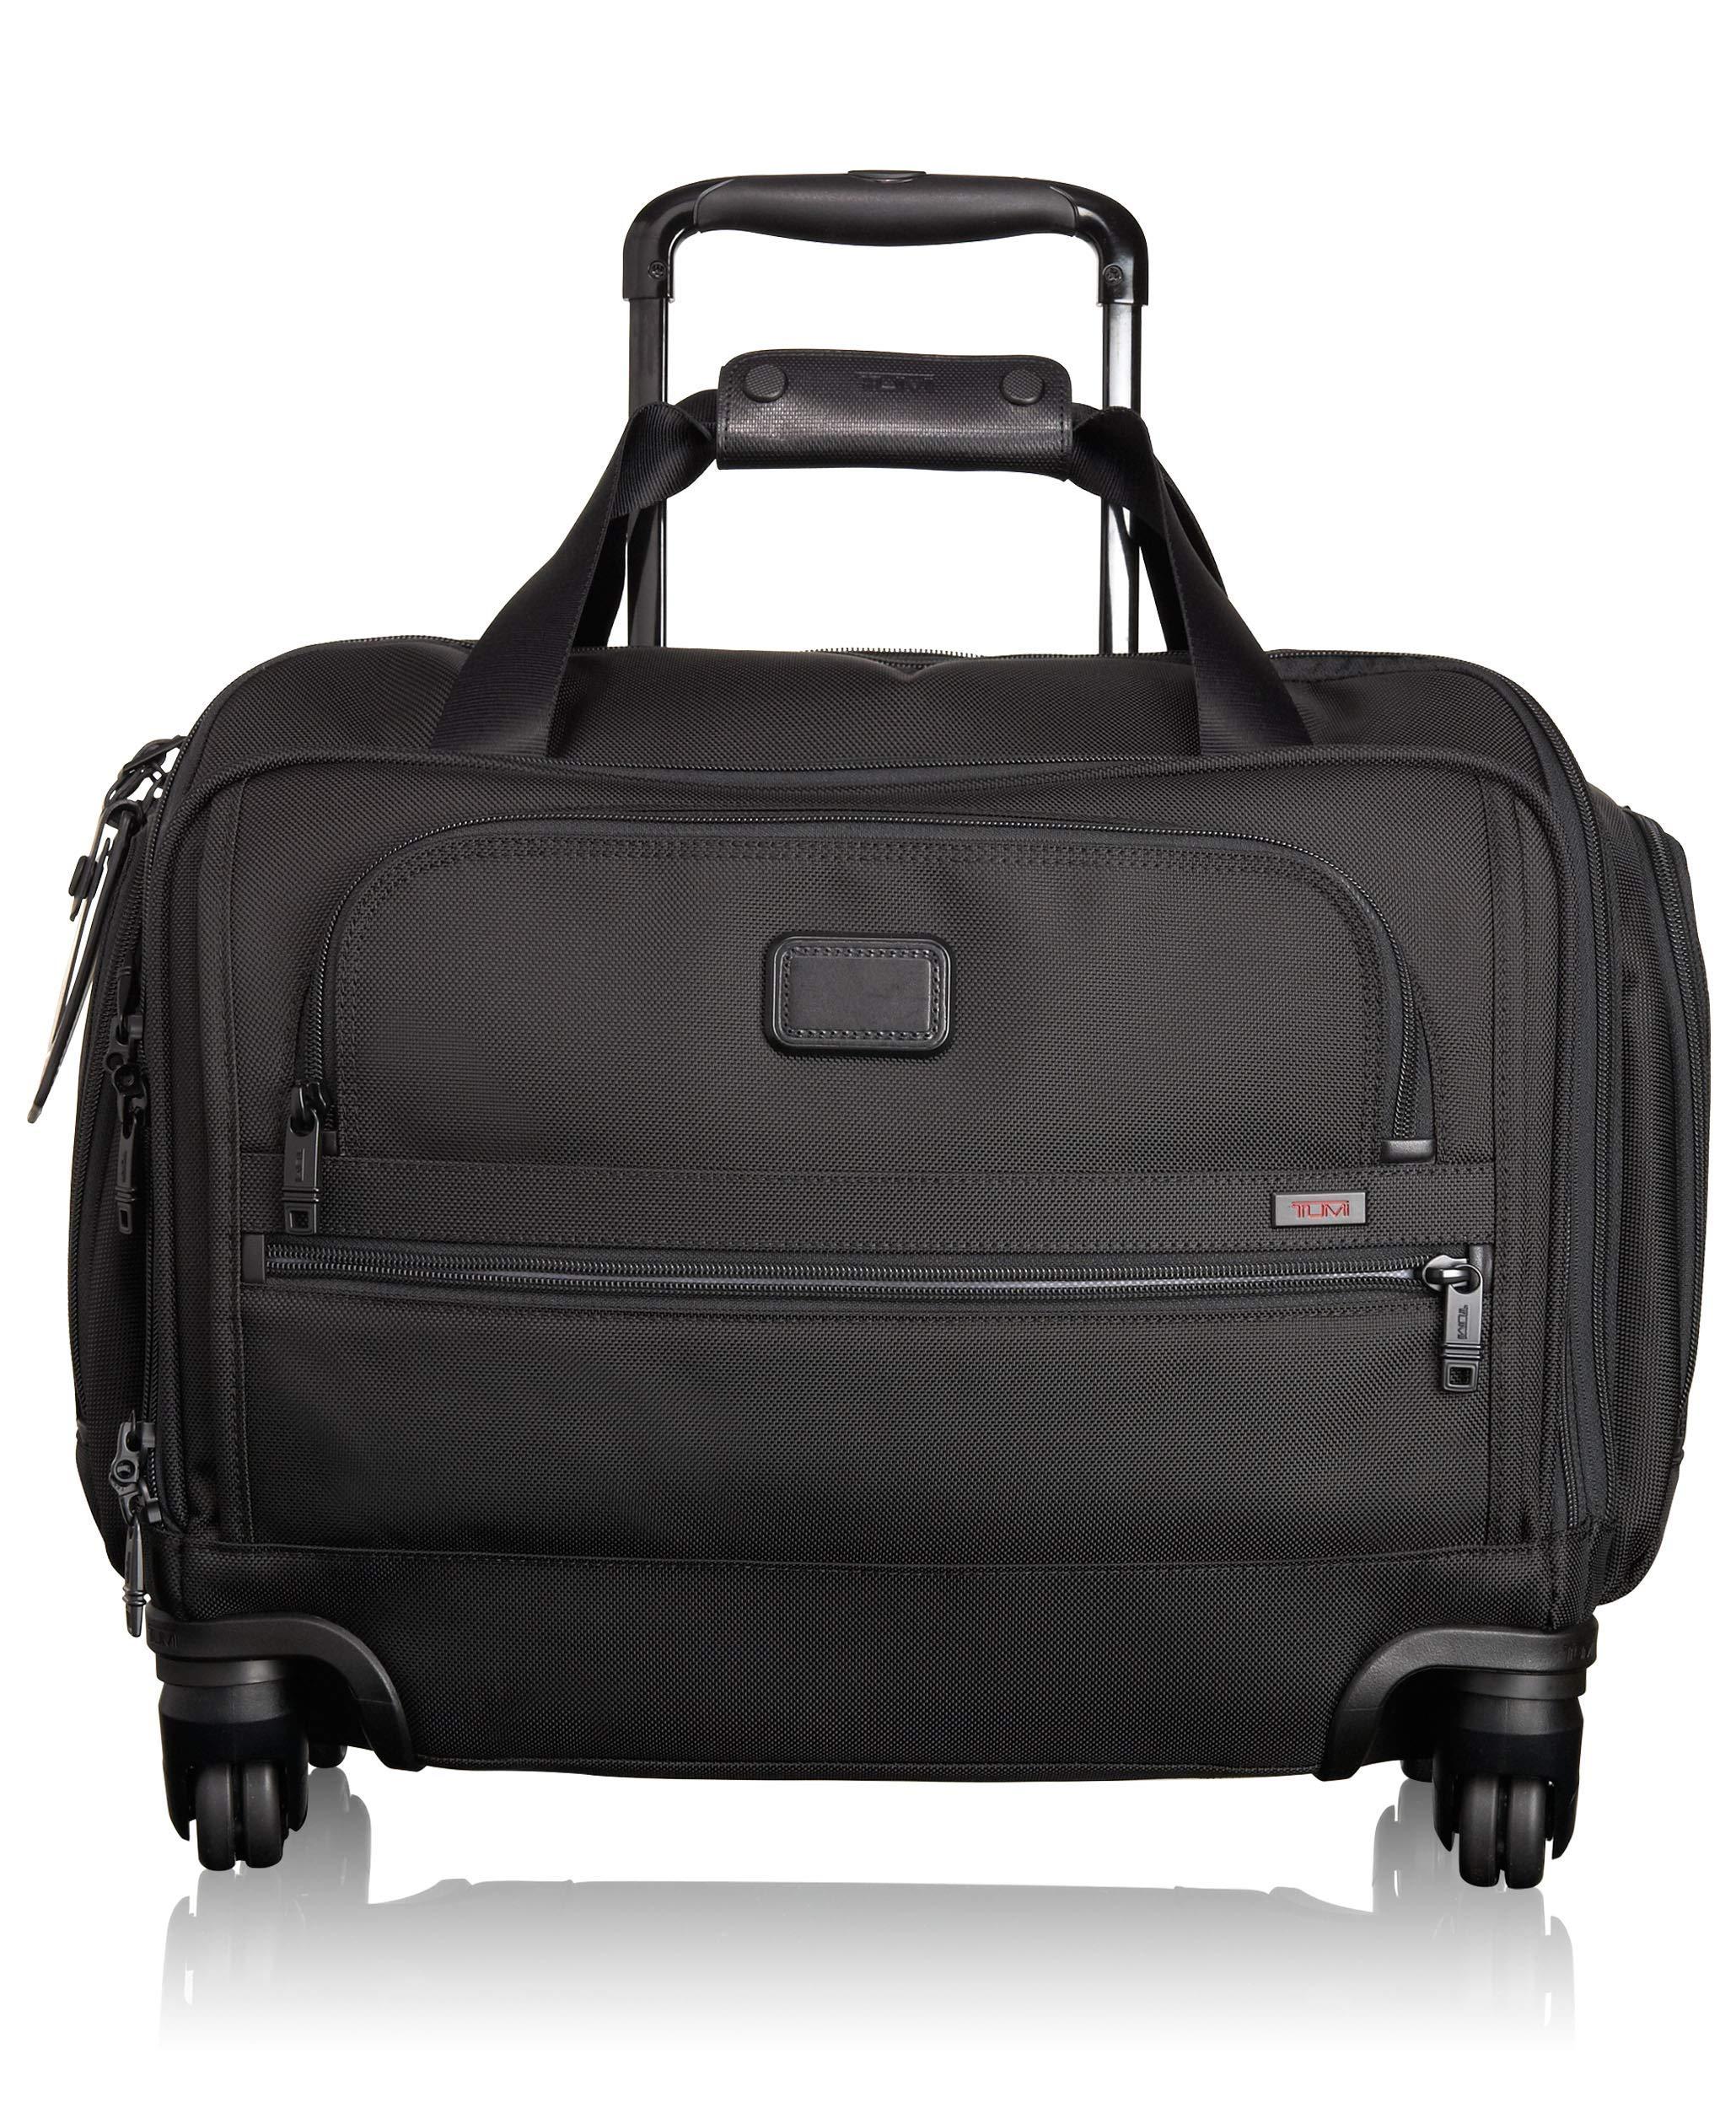 Tumi Alpha 2 Compact 4 Wheeled Carry On Duffel Bag